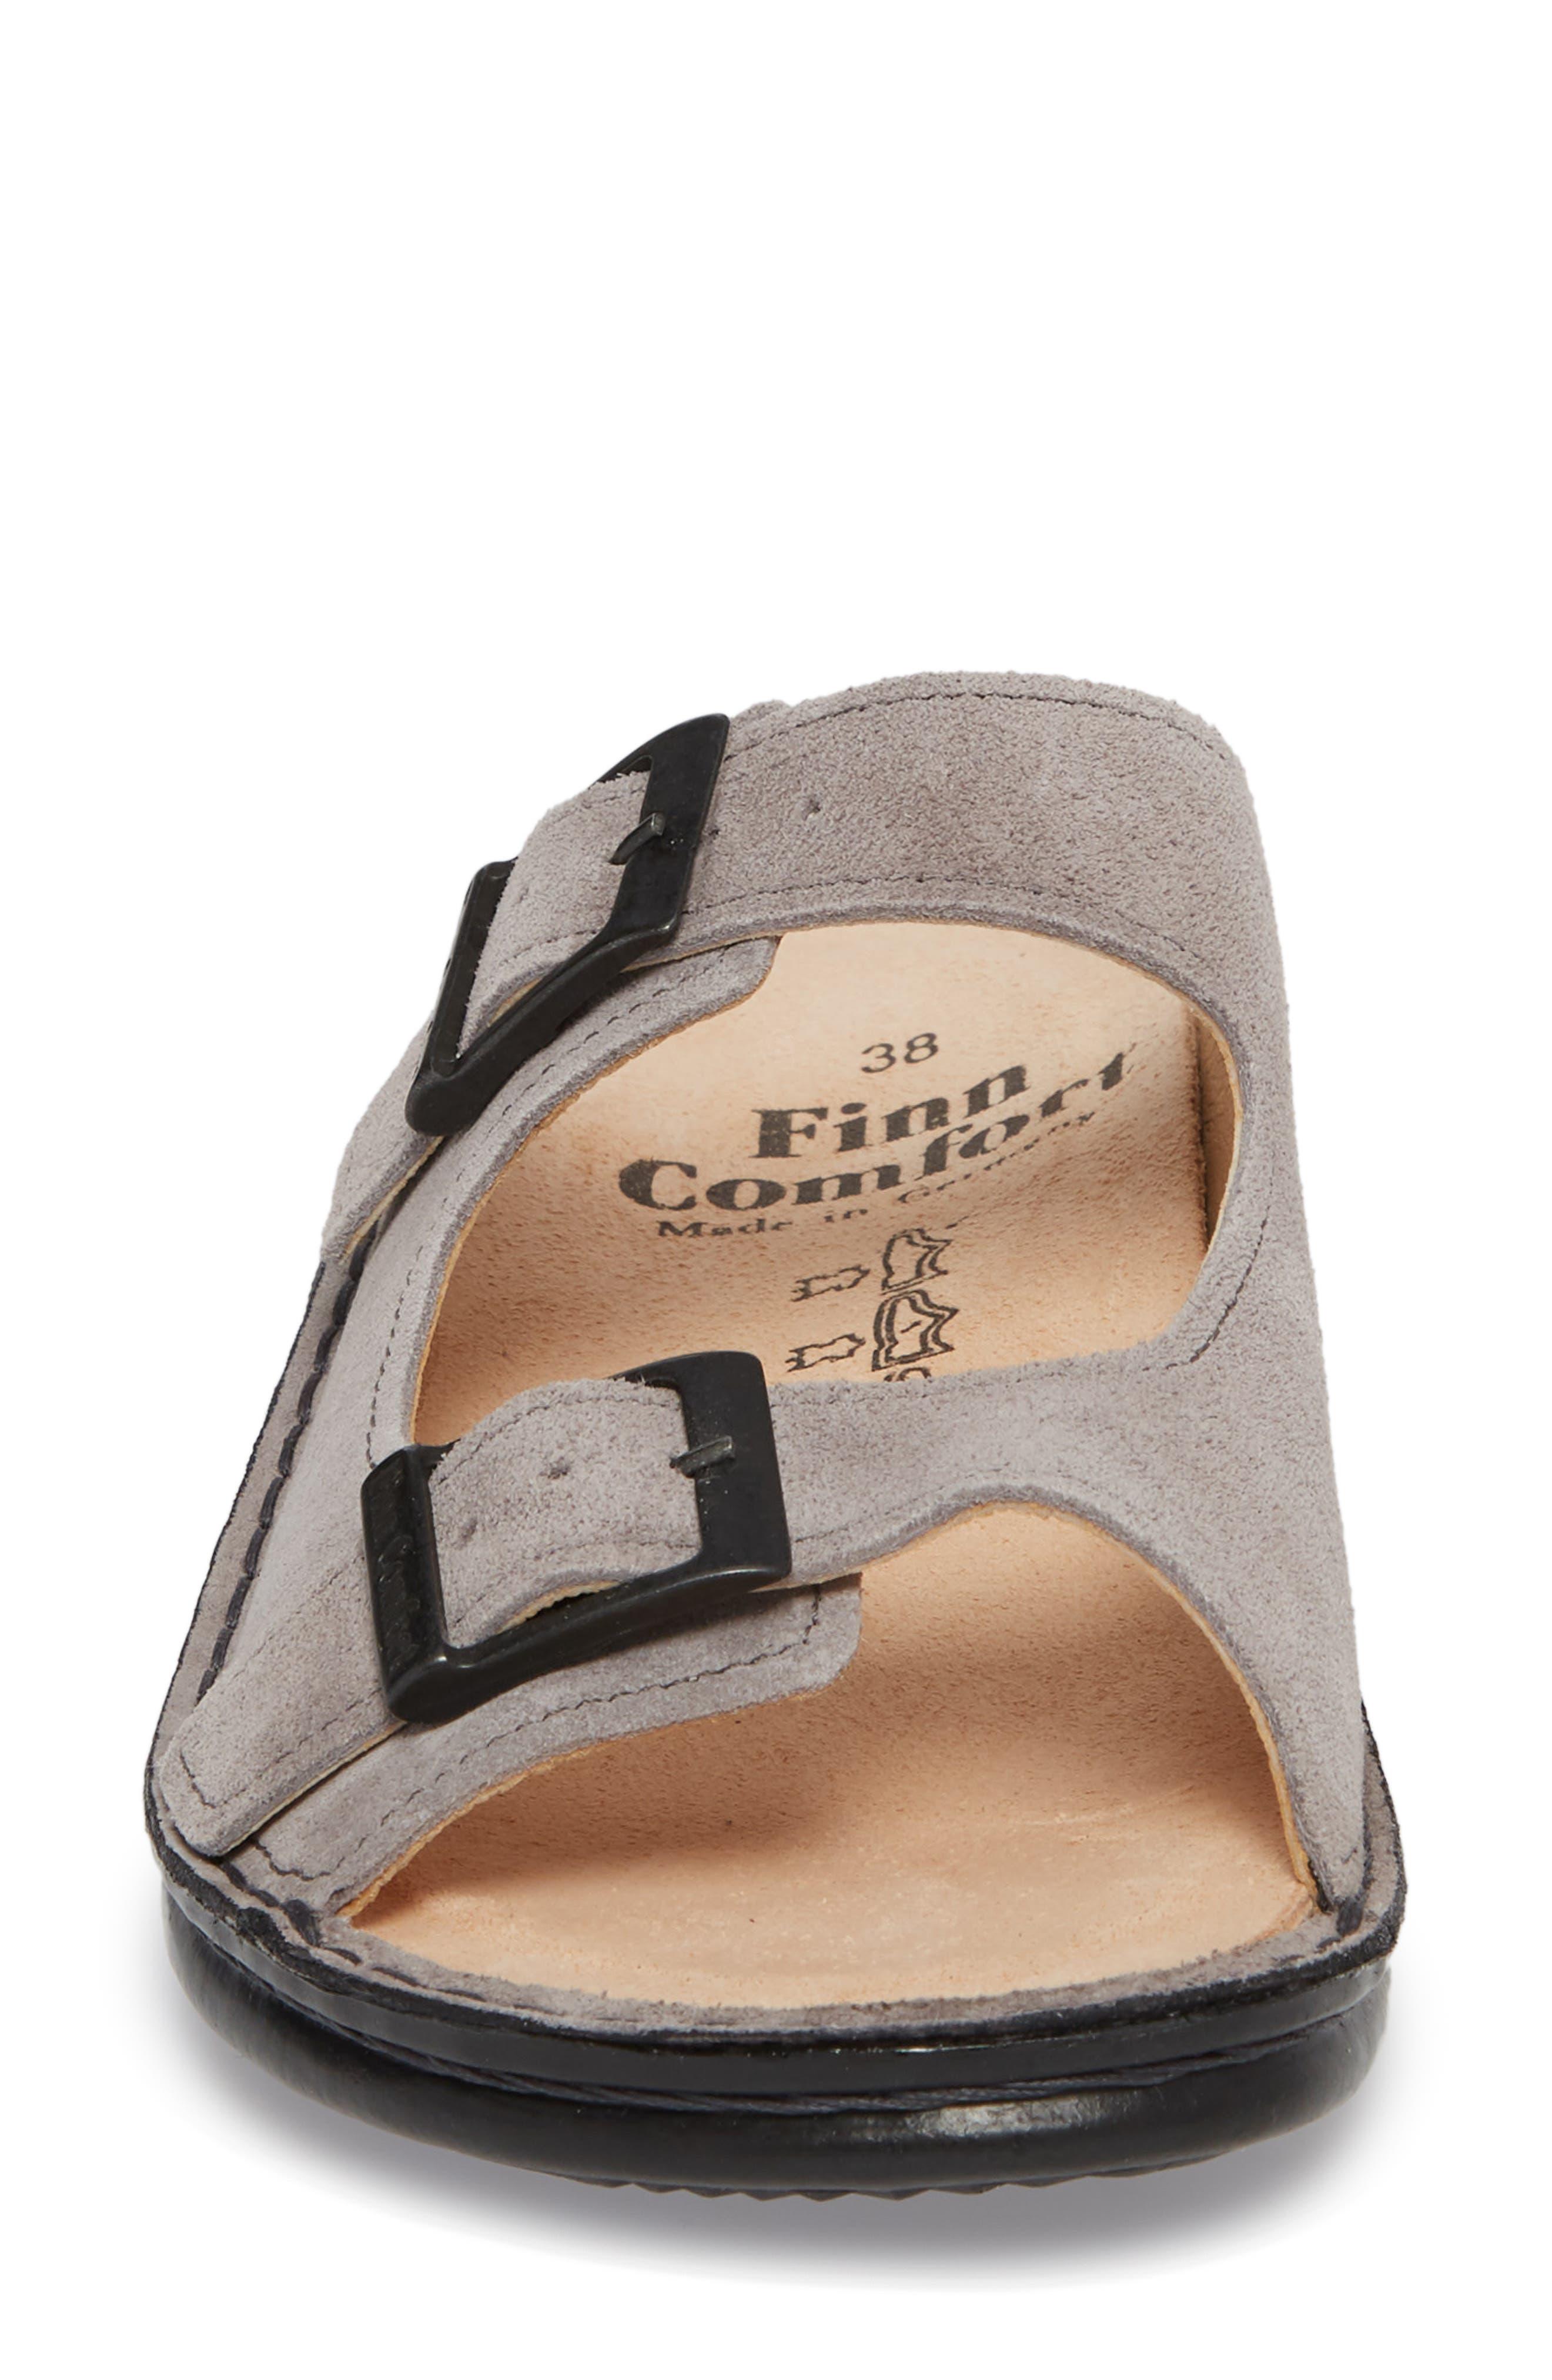 Hollister Slide Sandal,                             Alternate thumbnail 4, color,                             GINGER LEATHER